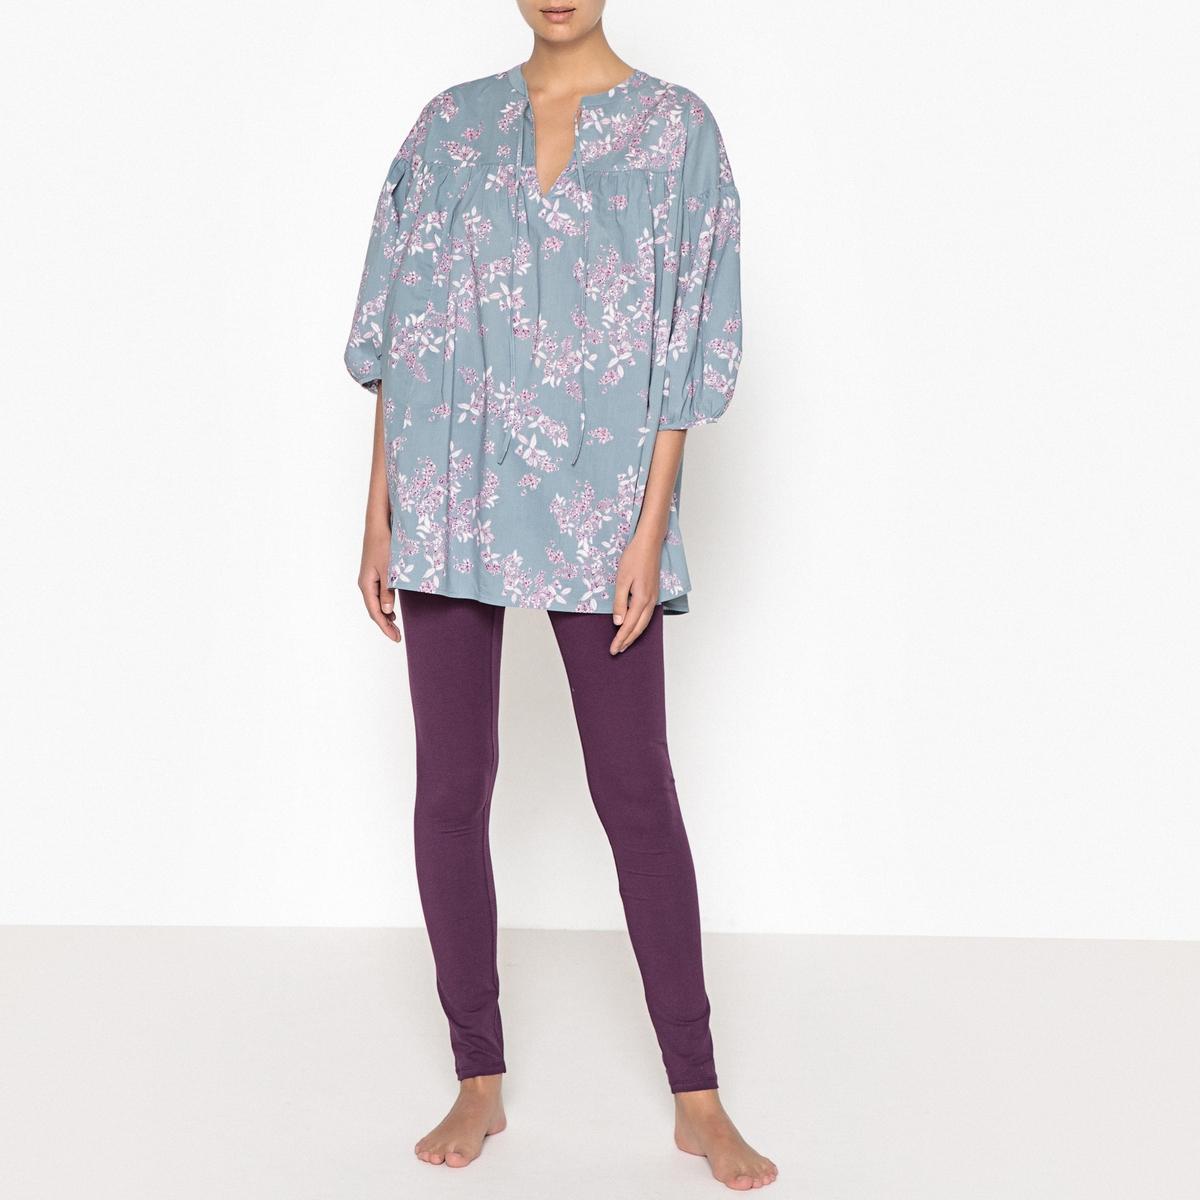 Pijama con motivo de flores